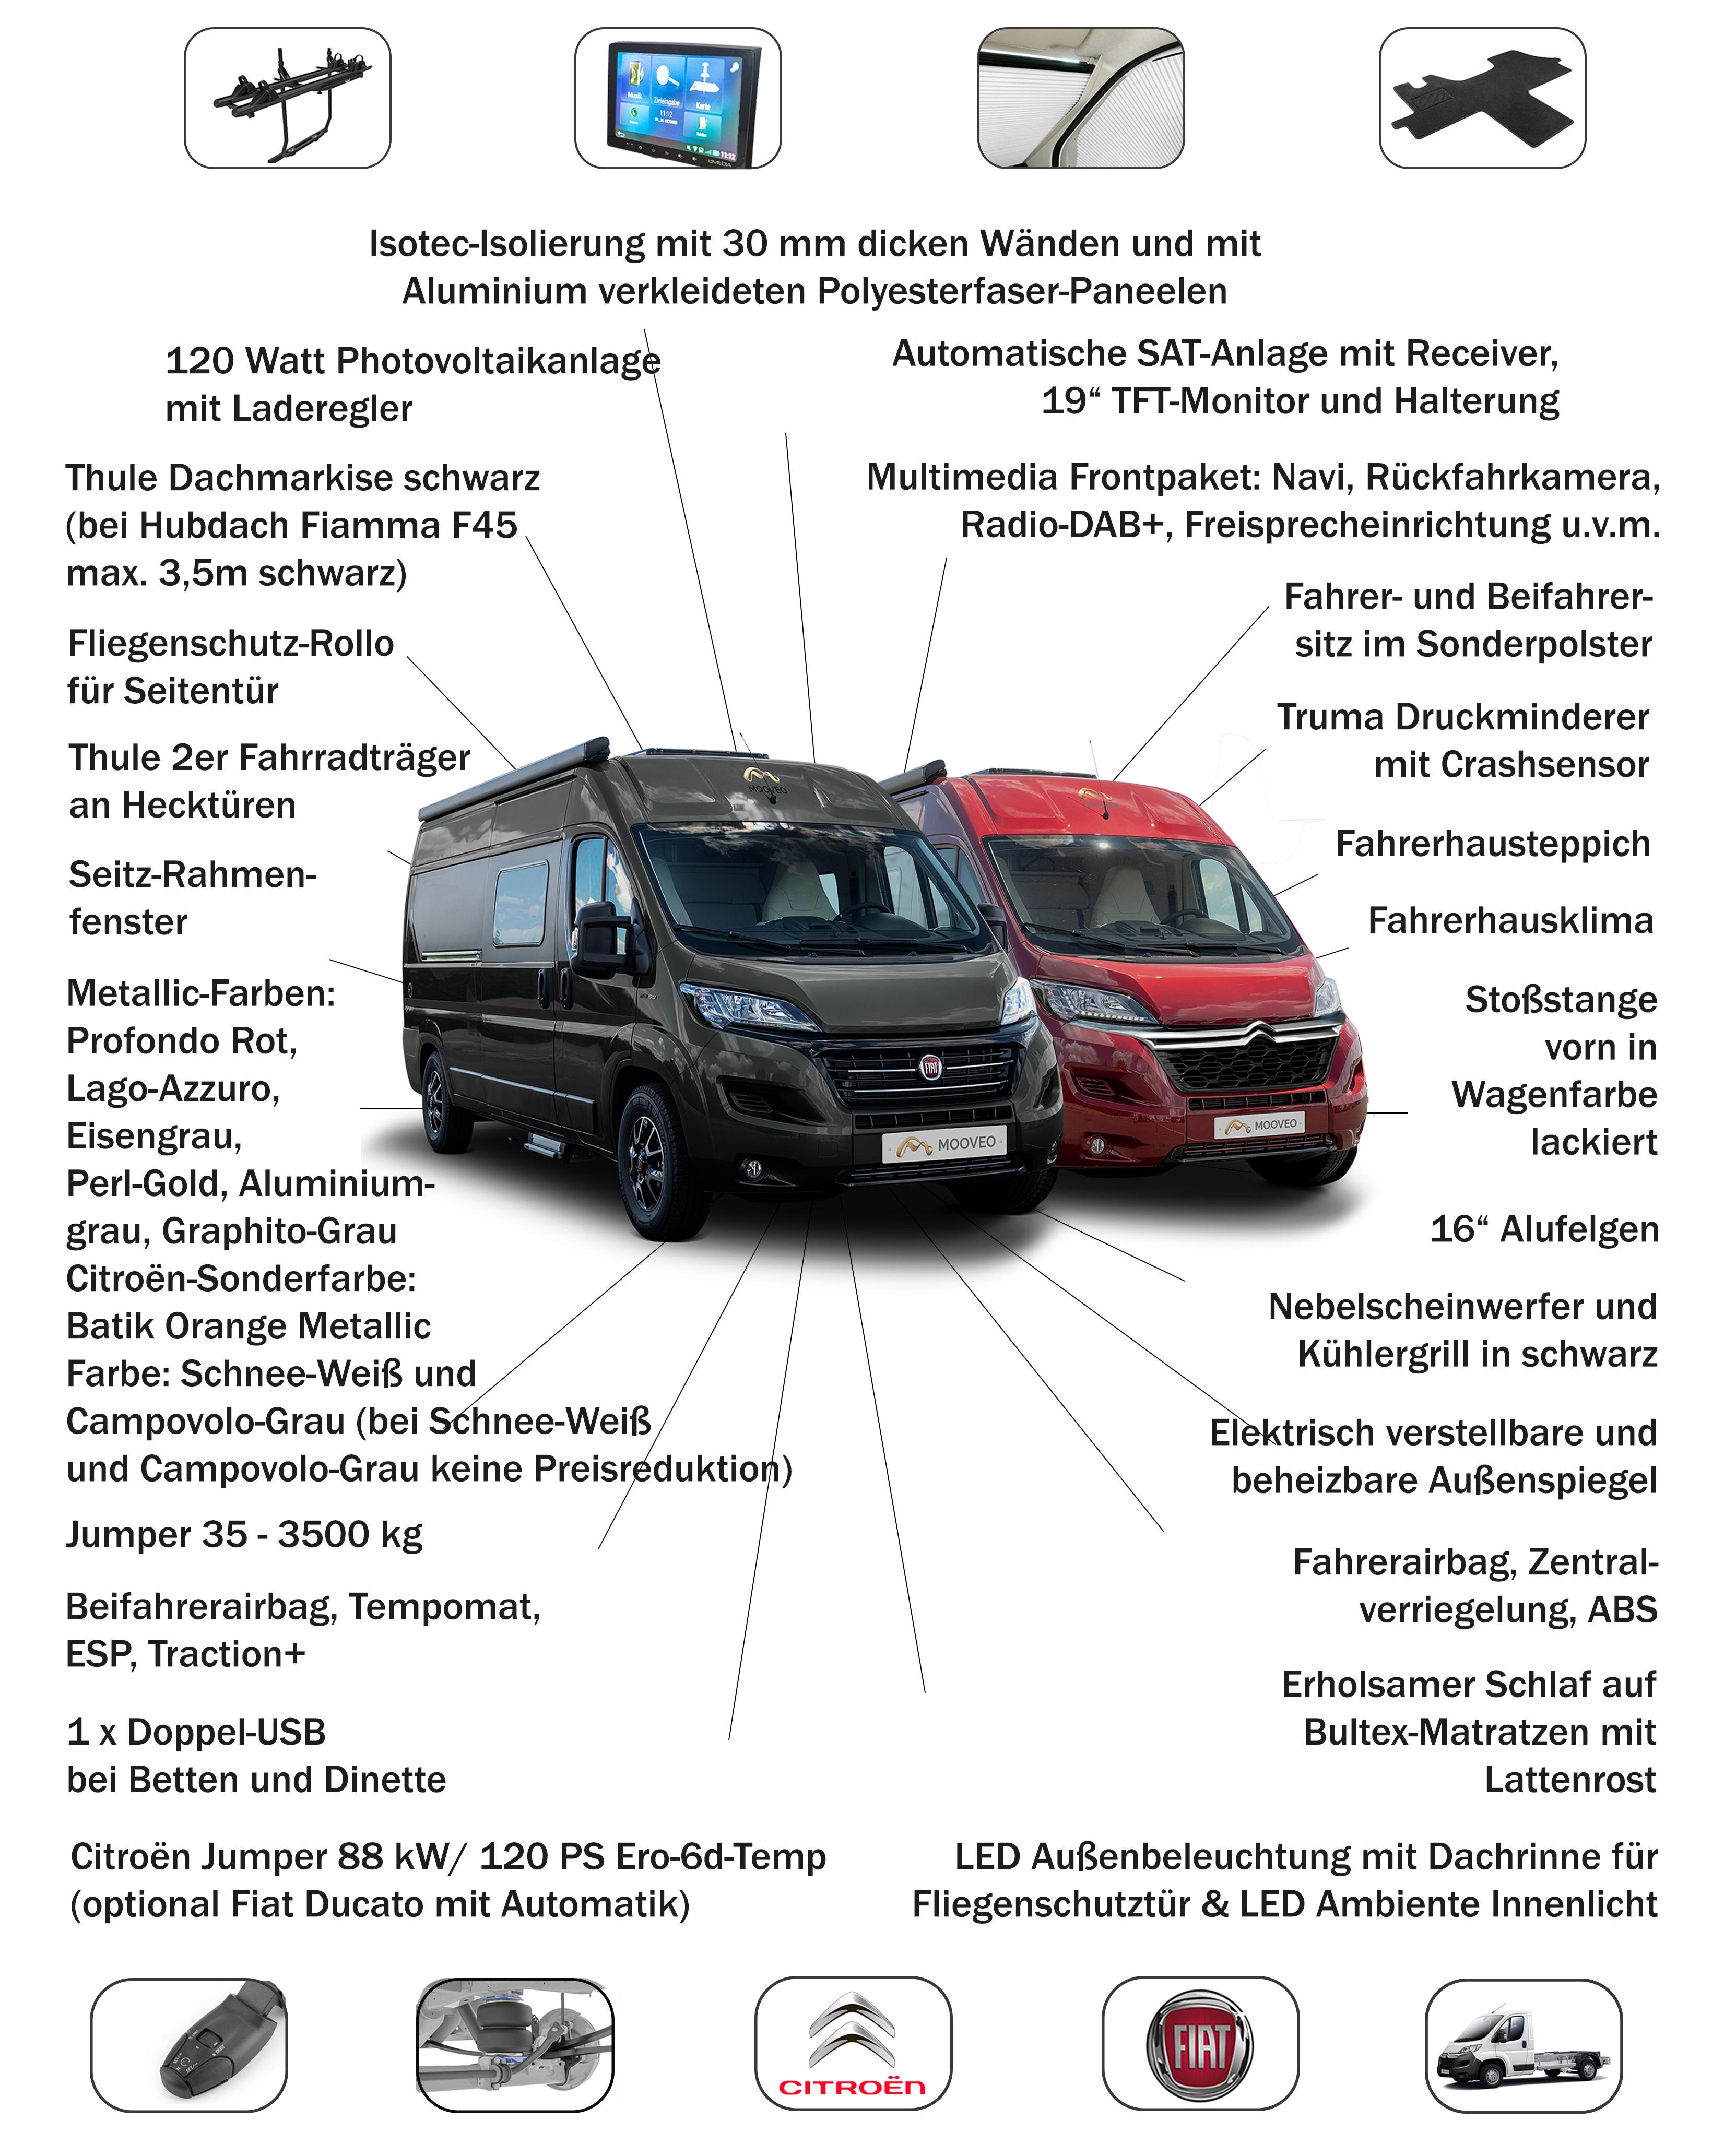 https://www.wof-wohnmobile.de/wp-content/uploads/Mooveo-Van_KOMPLETTPREISPAKET-ALL-IN-ONE_Grafik_2021_3MB.jpg